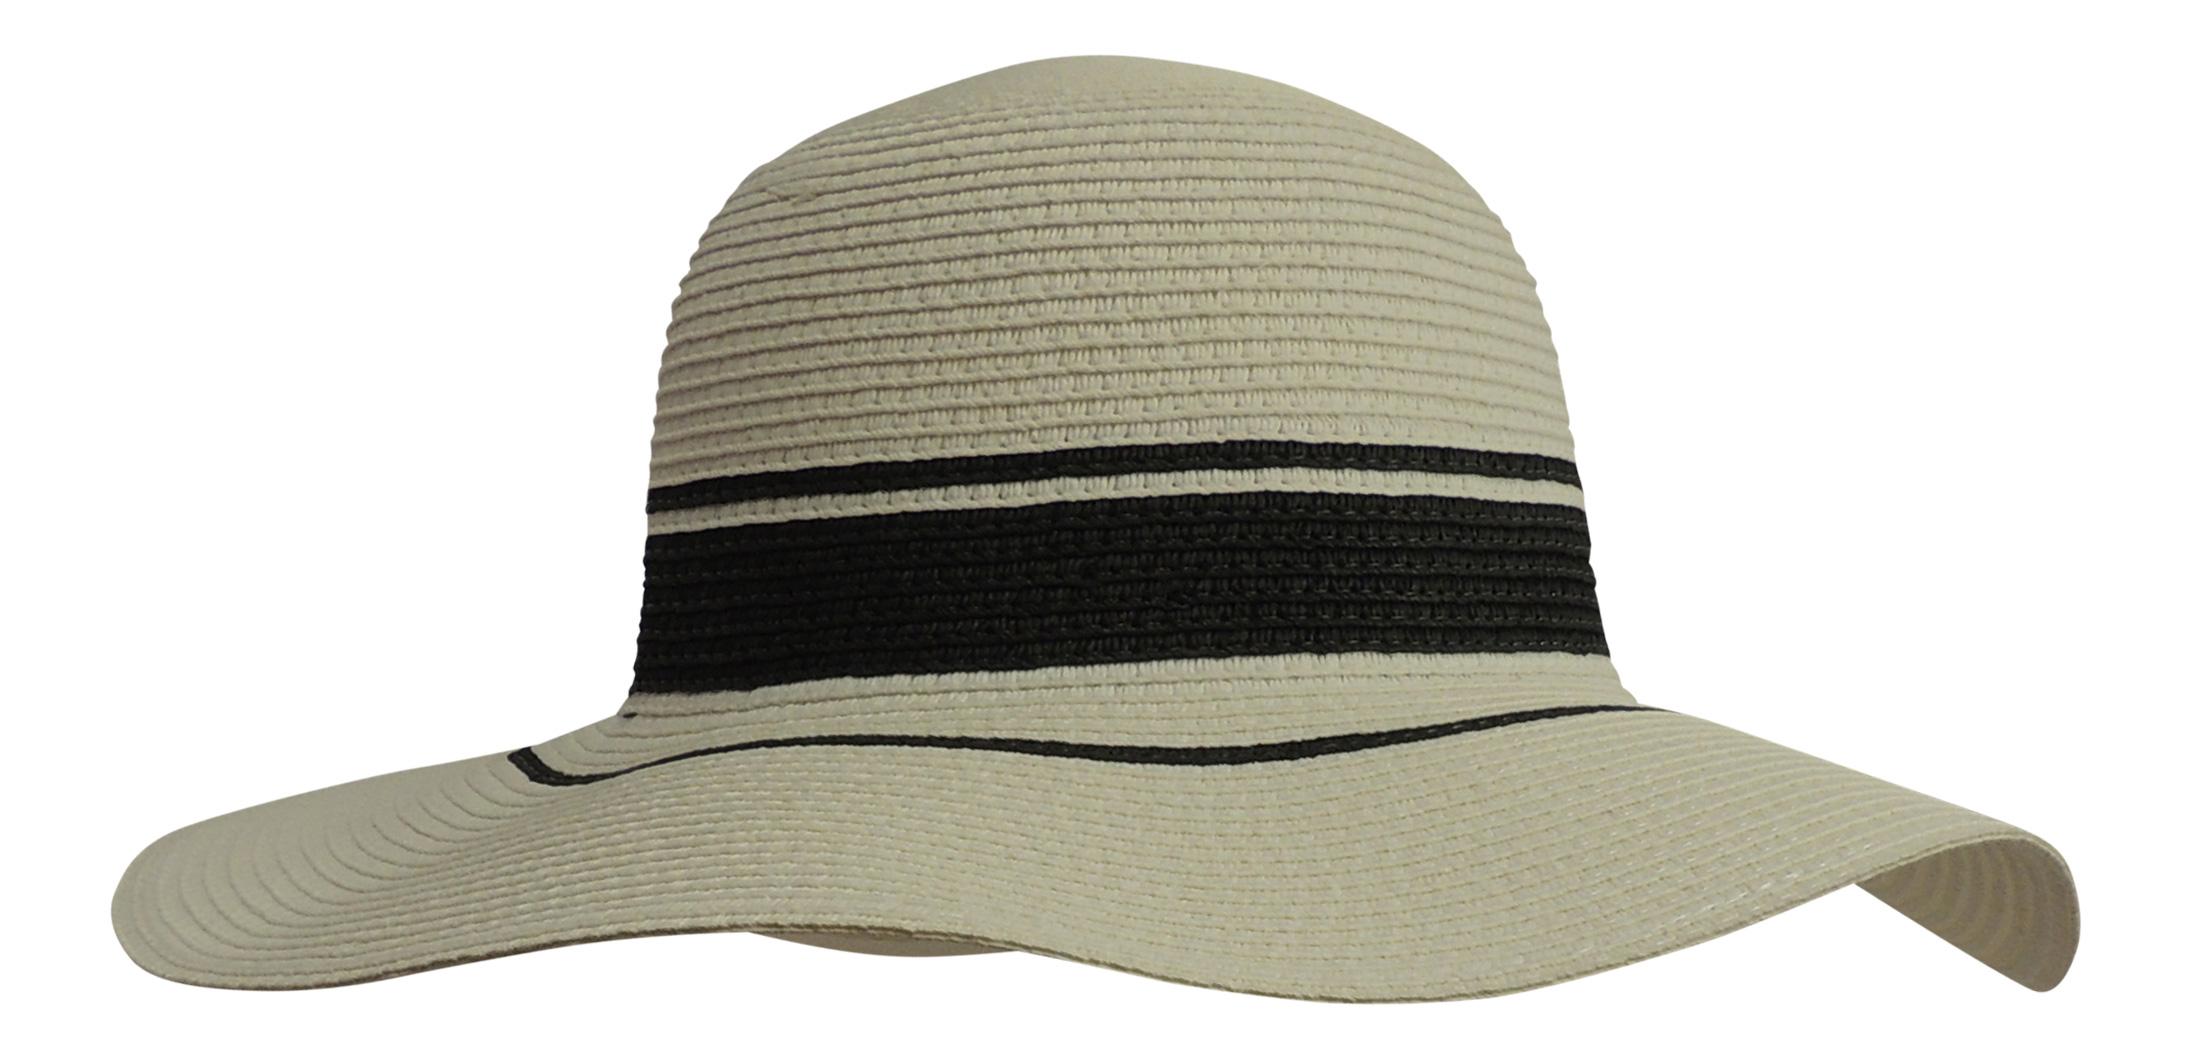 New Retro Wide Brim Floppy Black White Raffia Summer Sun Hat Vintage Style f6c3b533144c